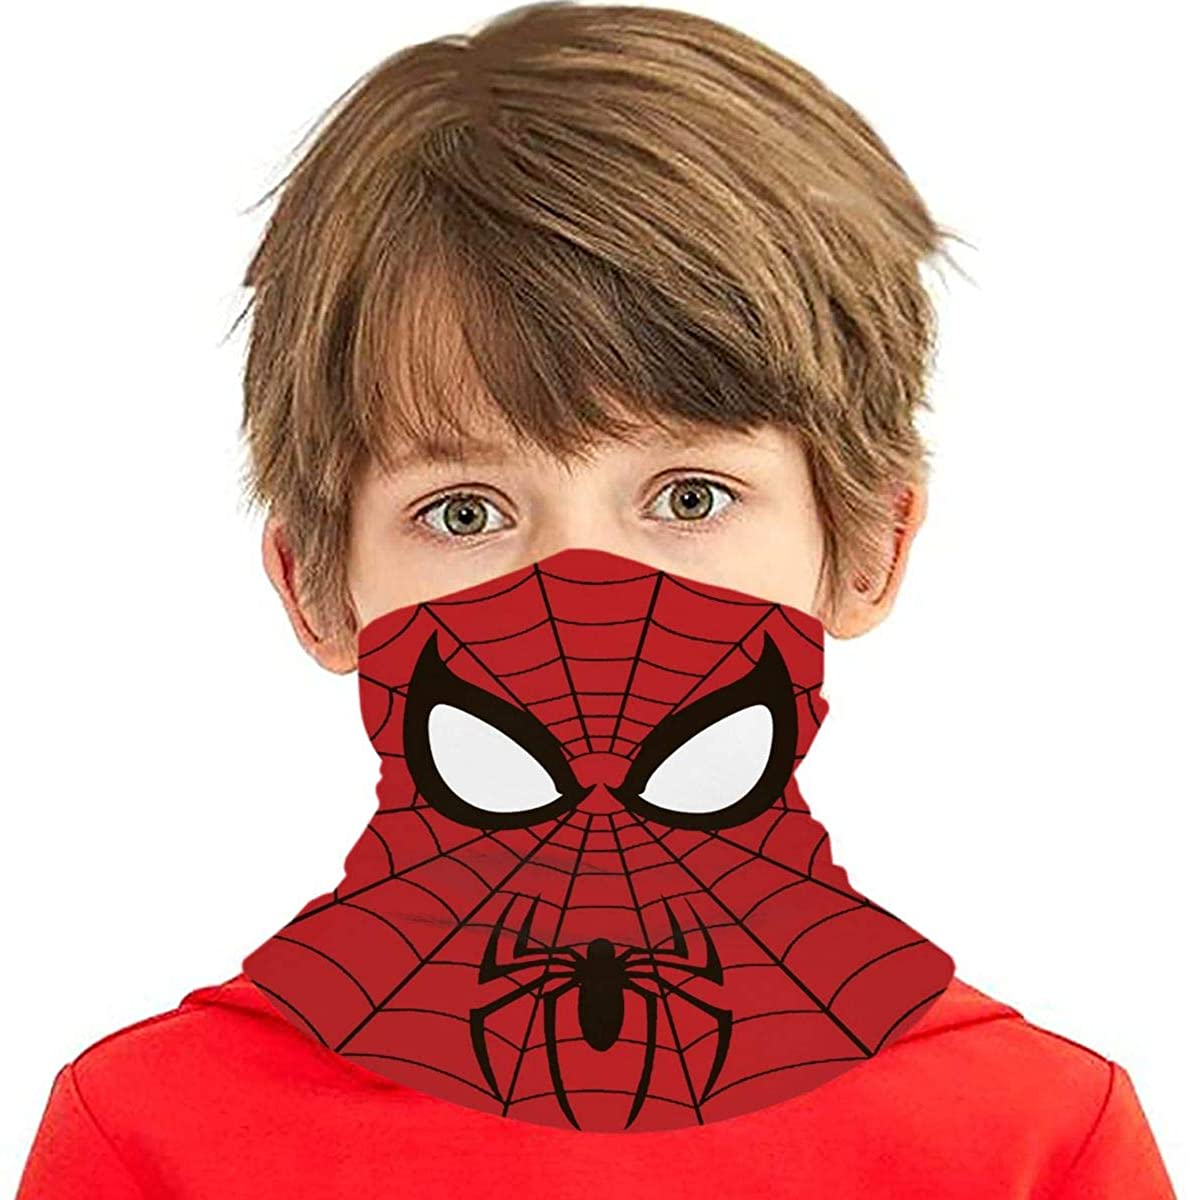 Aven-ge Super Heroes Bandanas Balaclavas Dustproof Bandanas Outdoor Headband Reusable Sports Scarf for Teenager